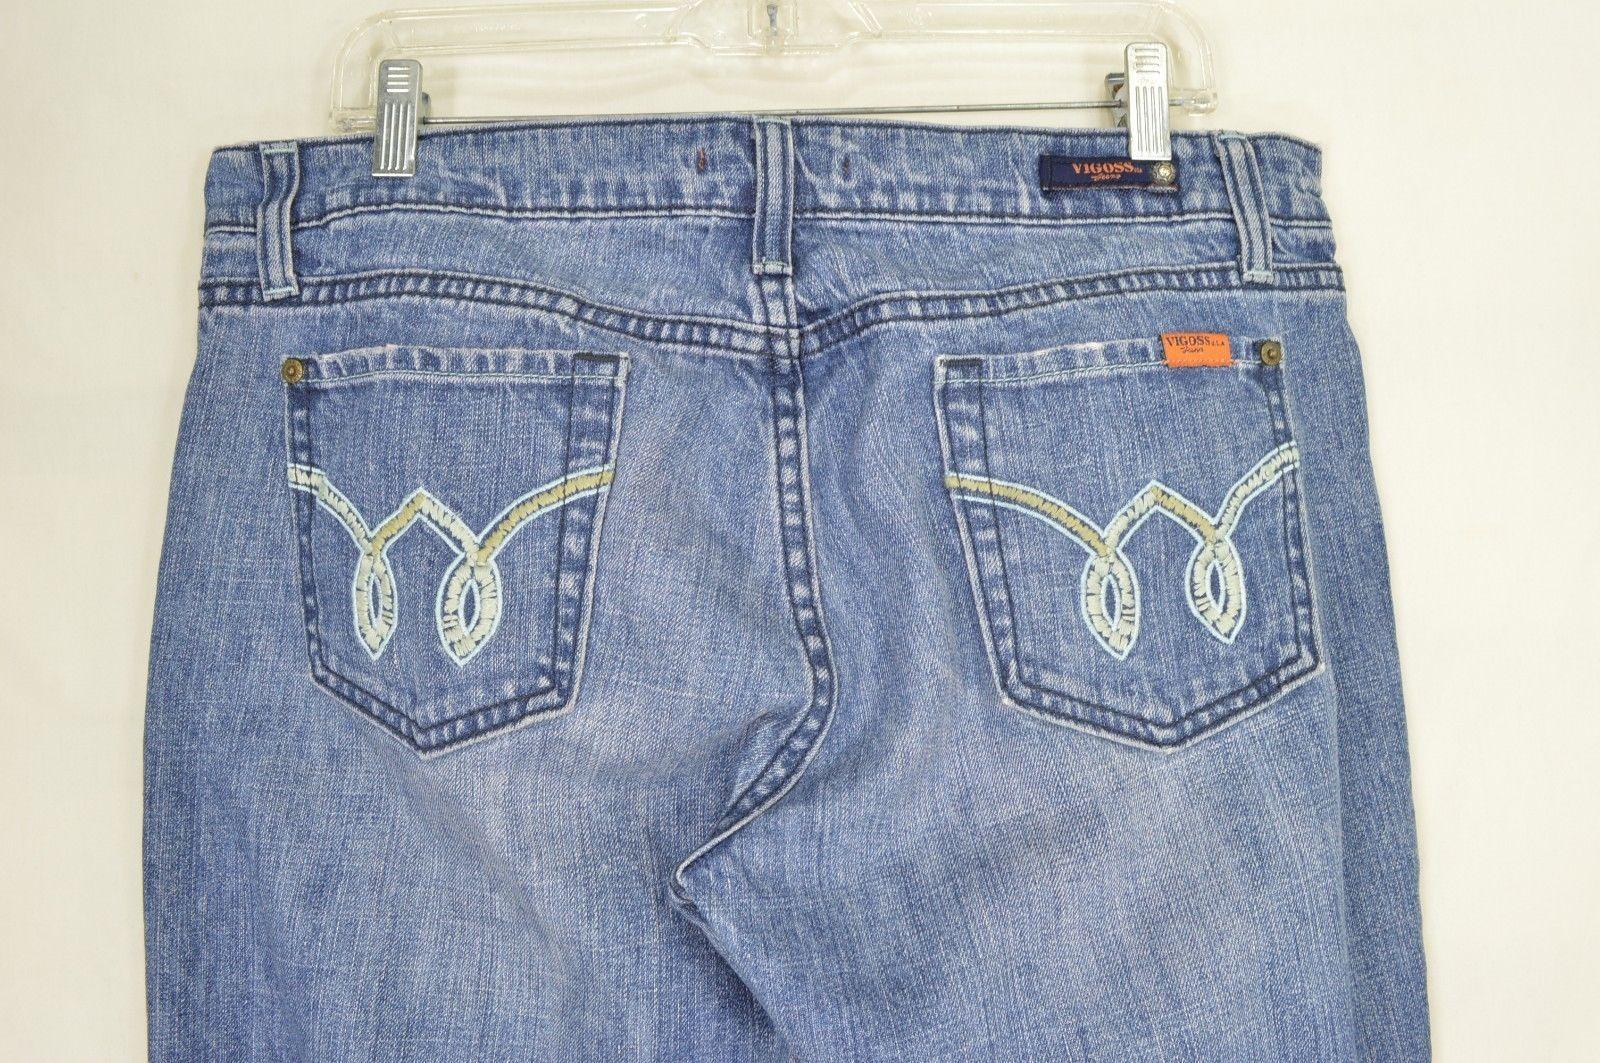 1 Vigoss jeans 15 x 35 medium wash long lean tall sexy embroidery back pockets